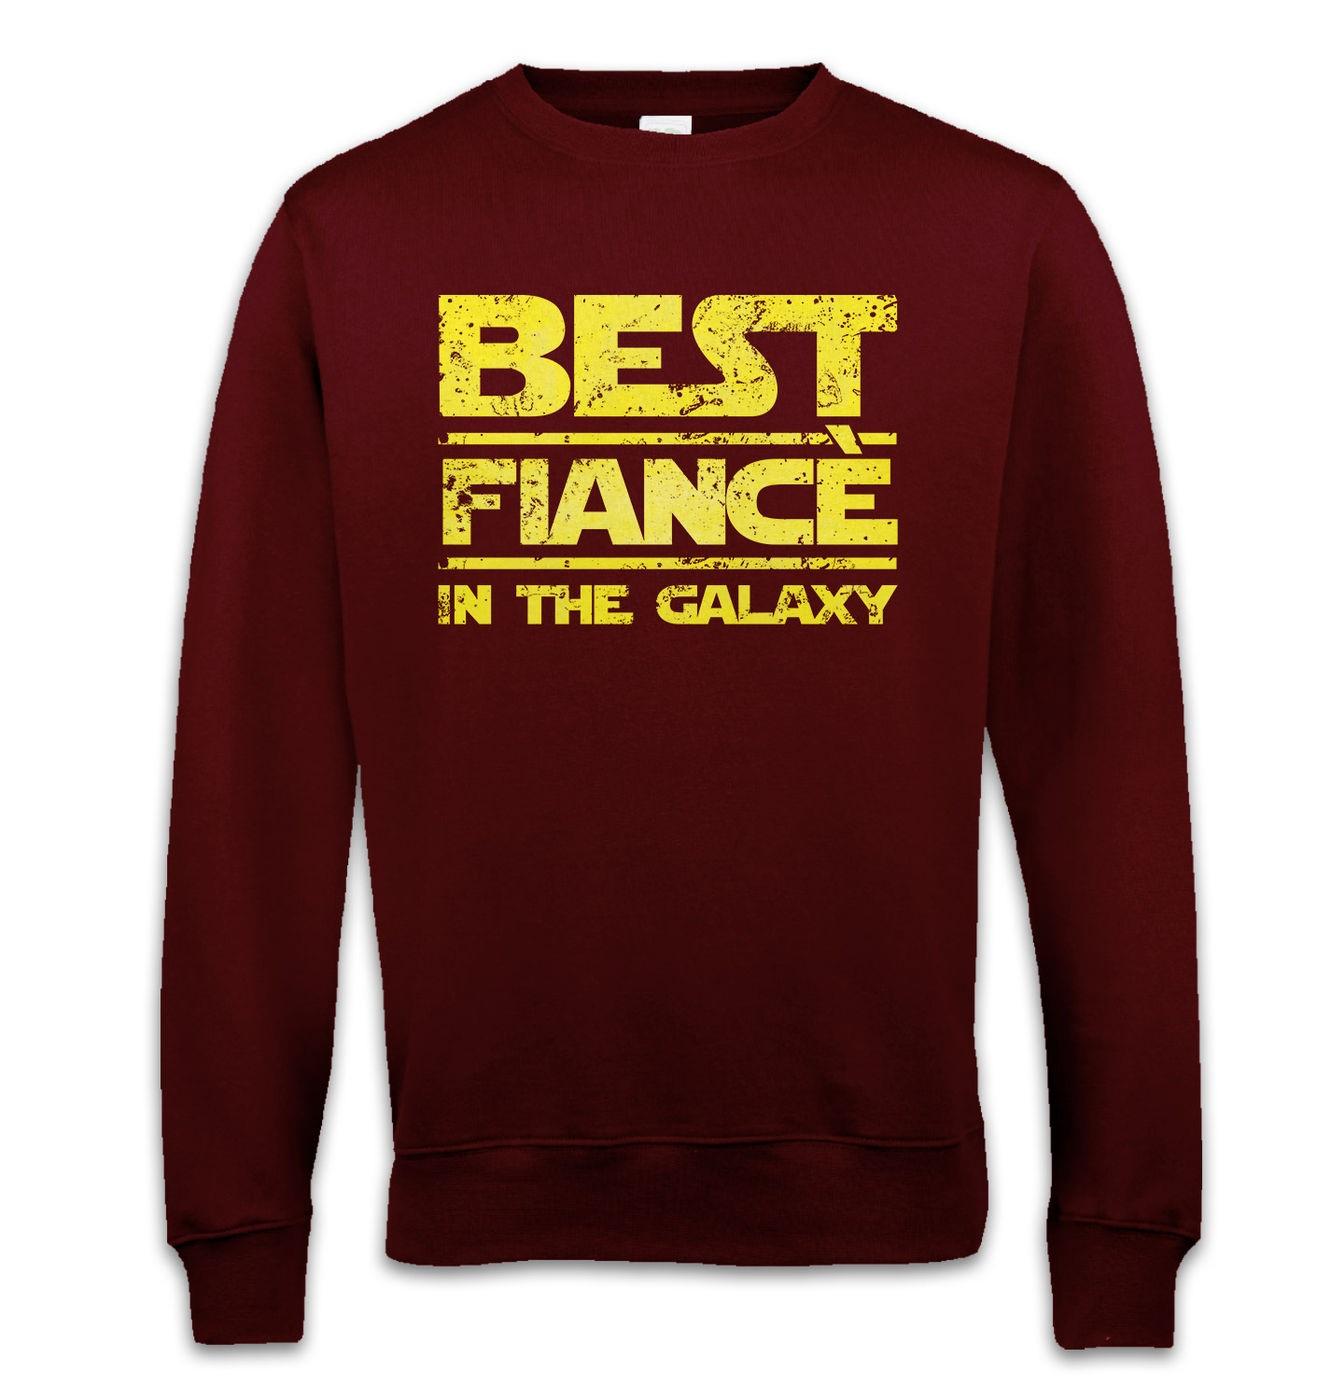 Best Fiance In The Galaxy sweatshirt by Something Geeky